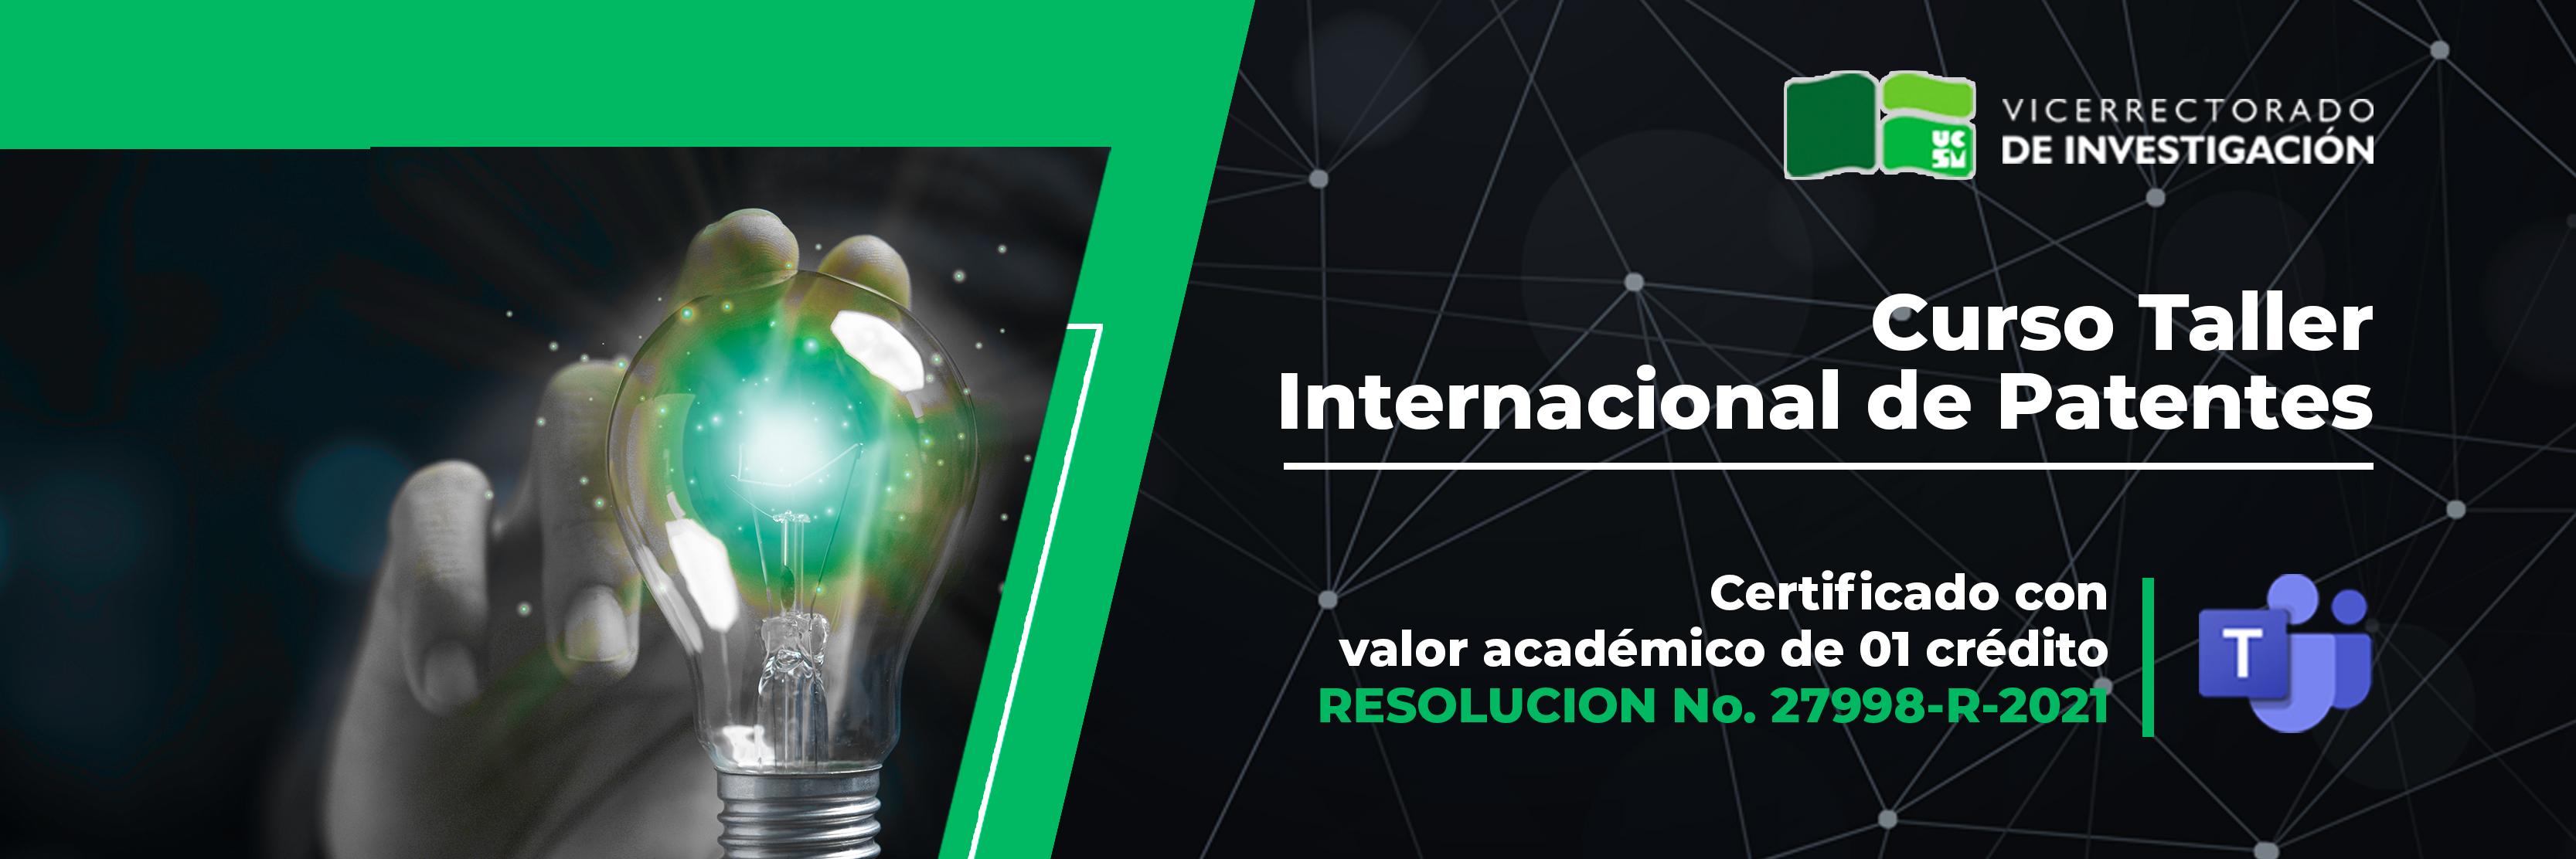 taller-internacional-de-patentes